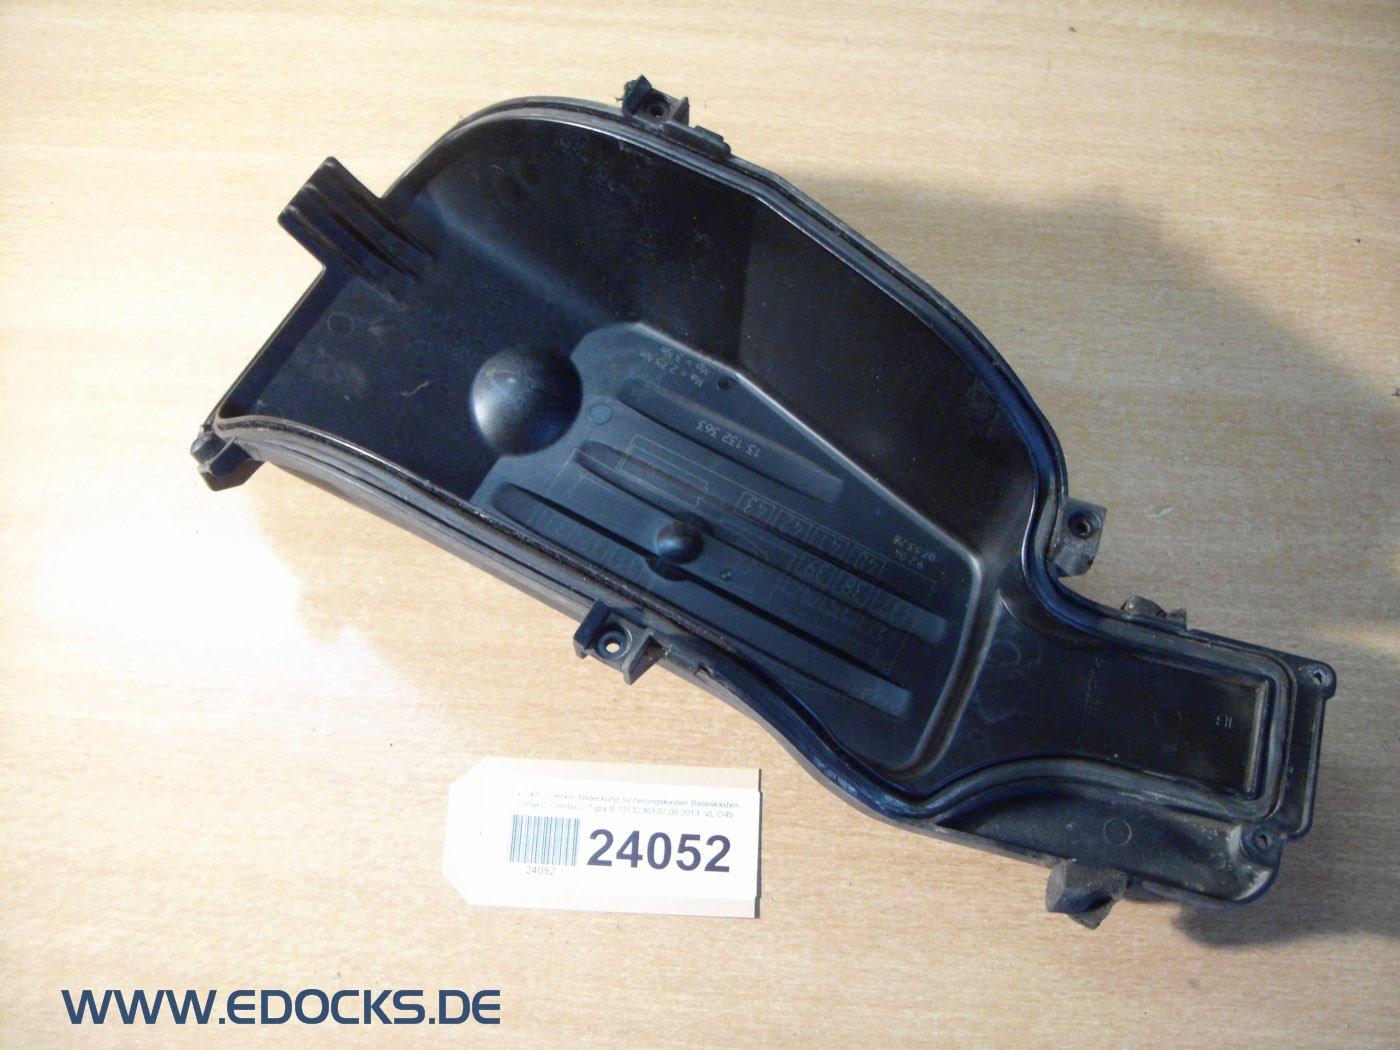 Fuse Box with Lid Cover Relaiskasten C Combo / Corsa C (Opel) Tigra B:  Amazon.co.uk: Car & Motorbike